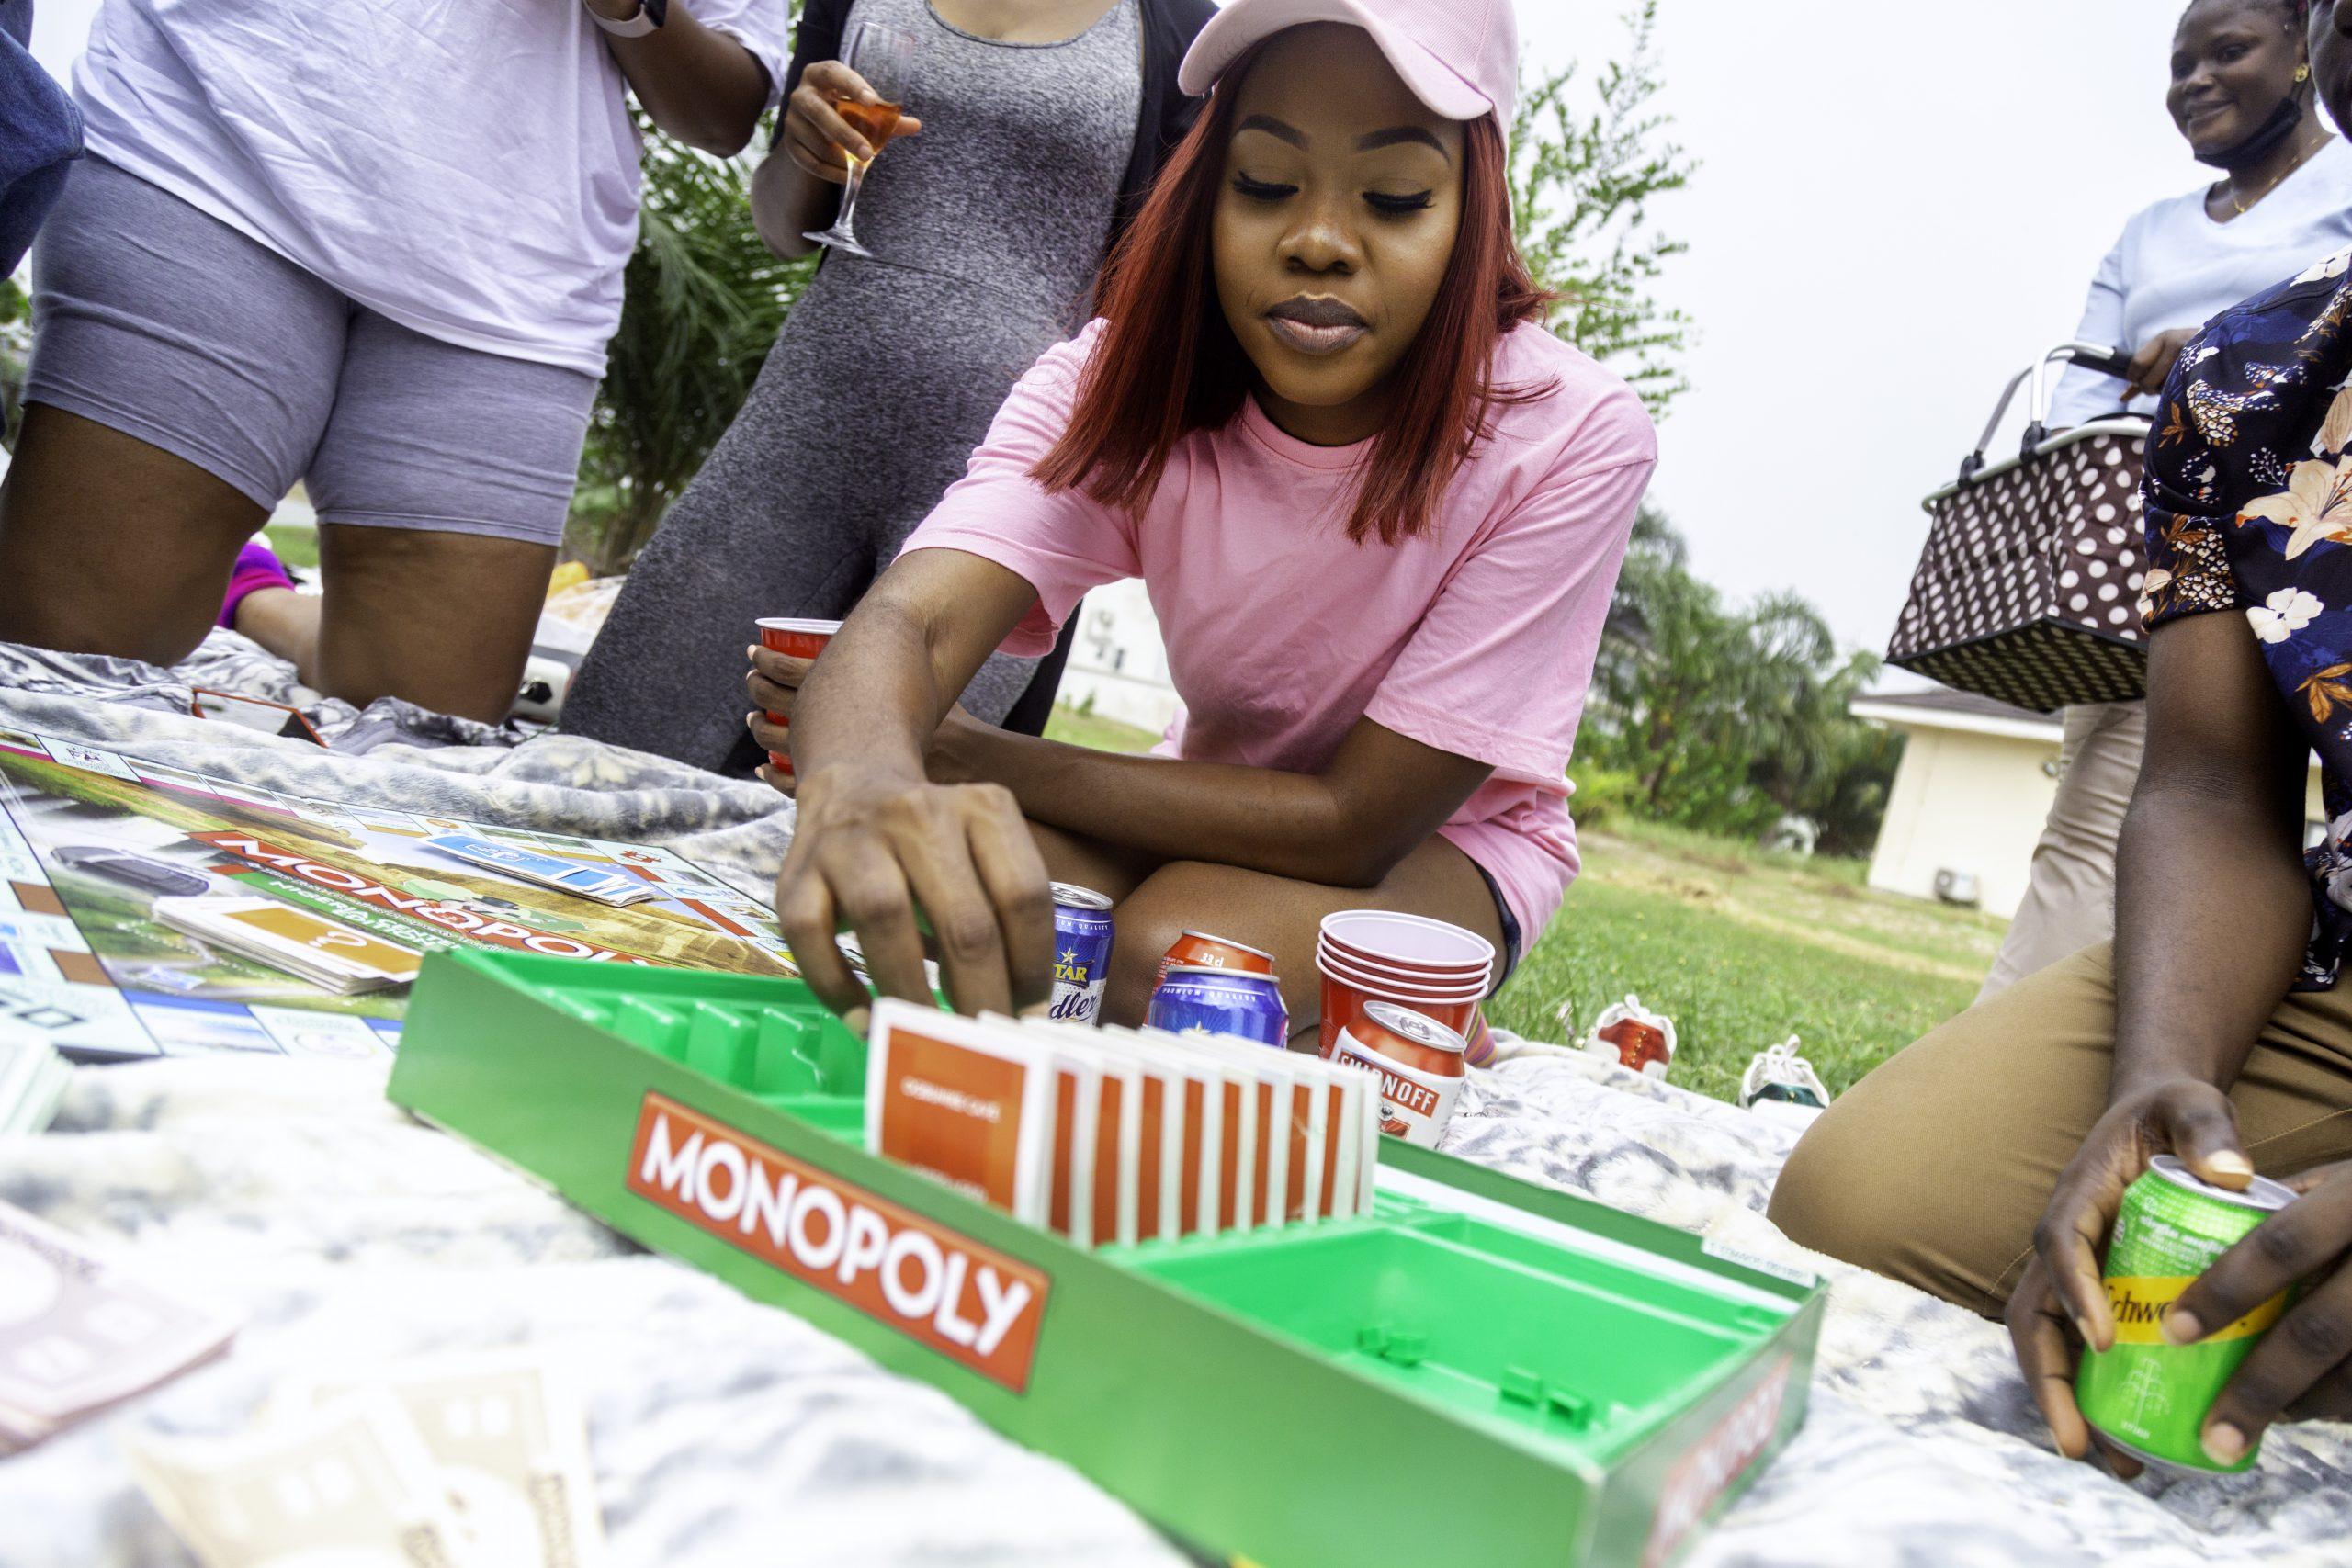 Board games go with outdoor picnics at Lakowe Lakes